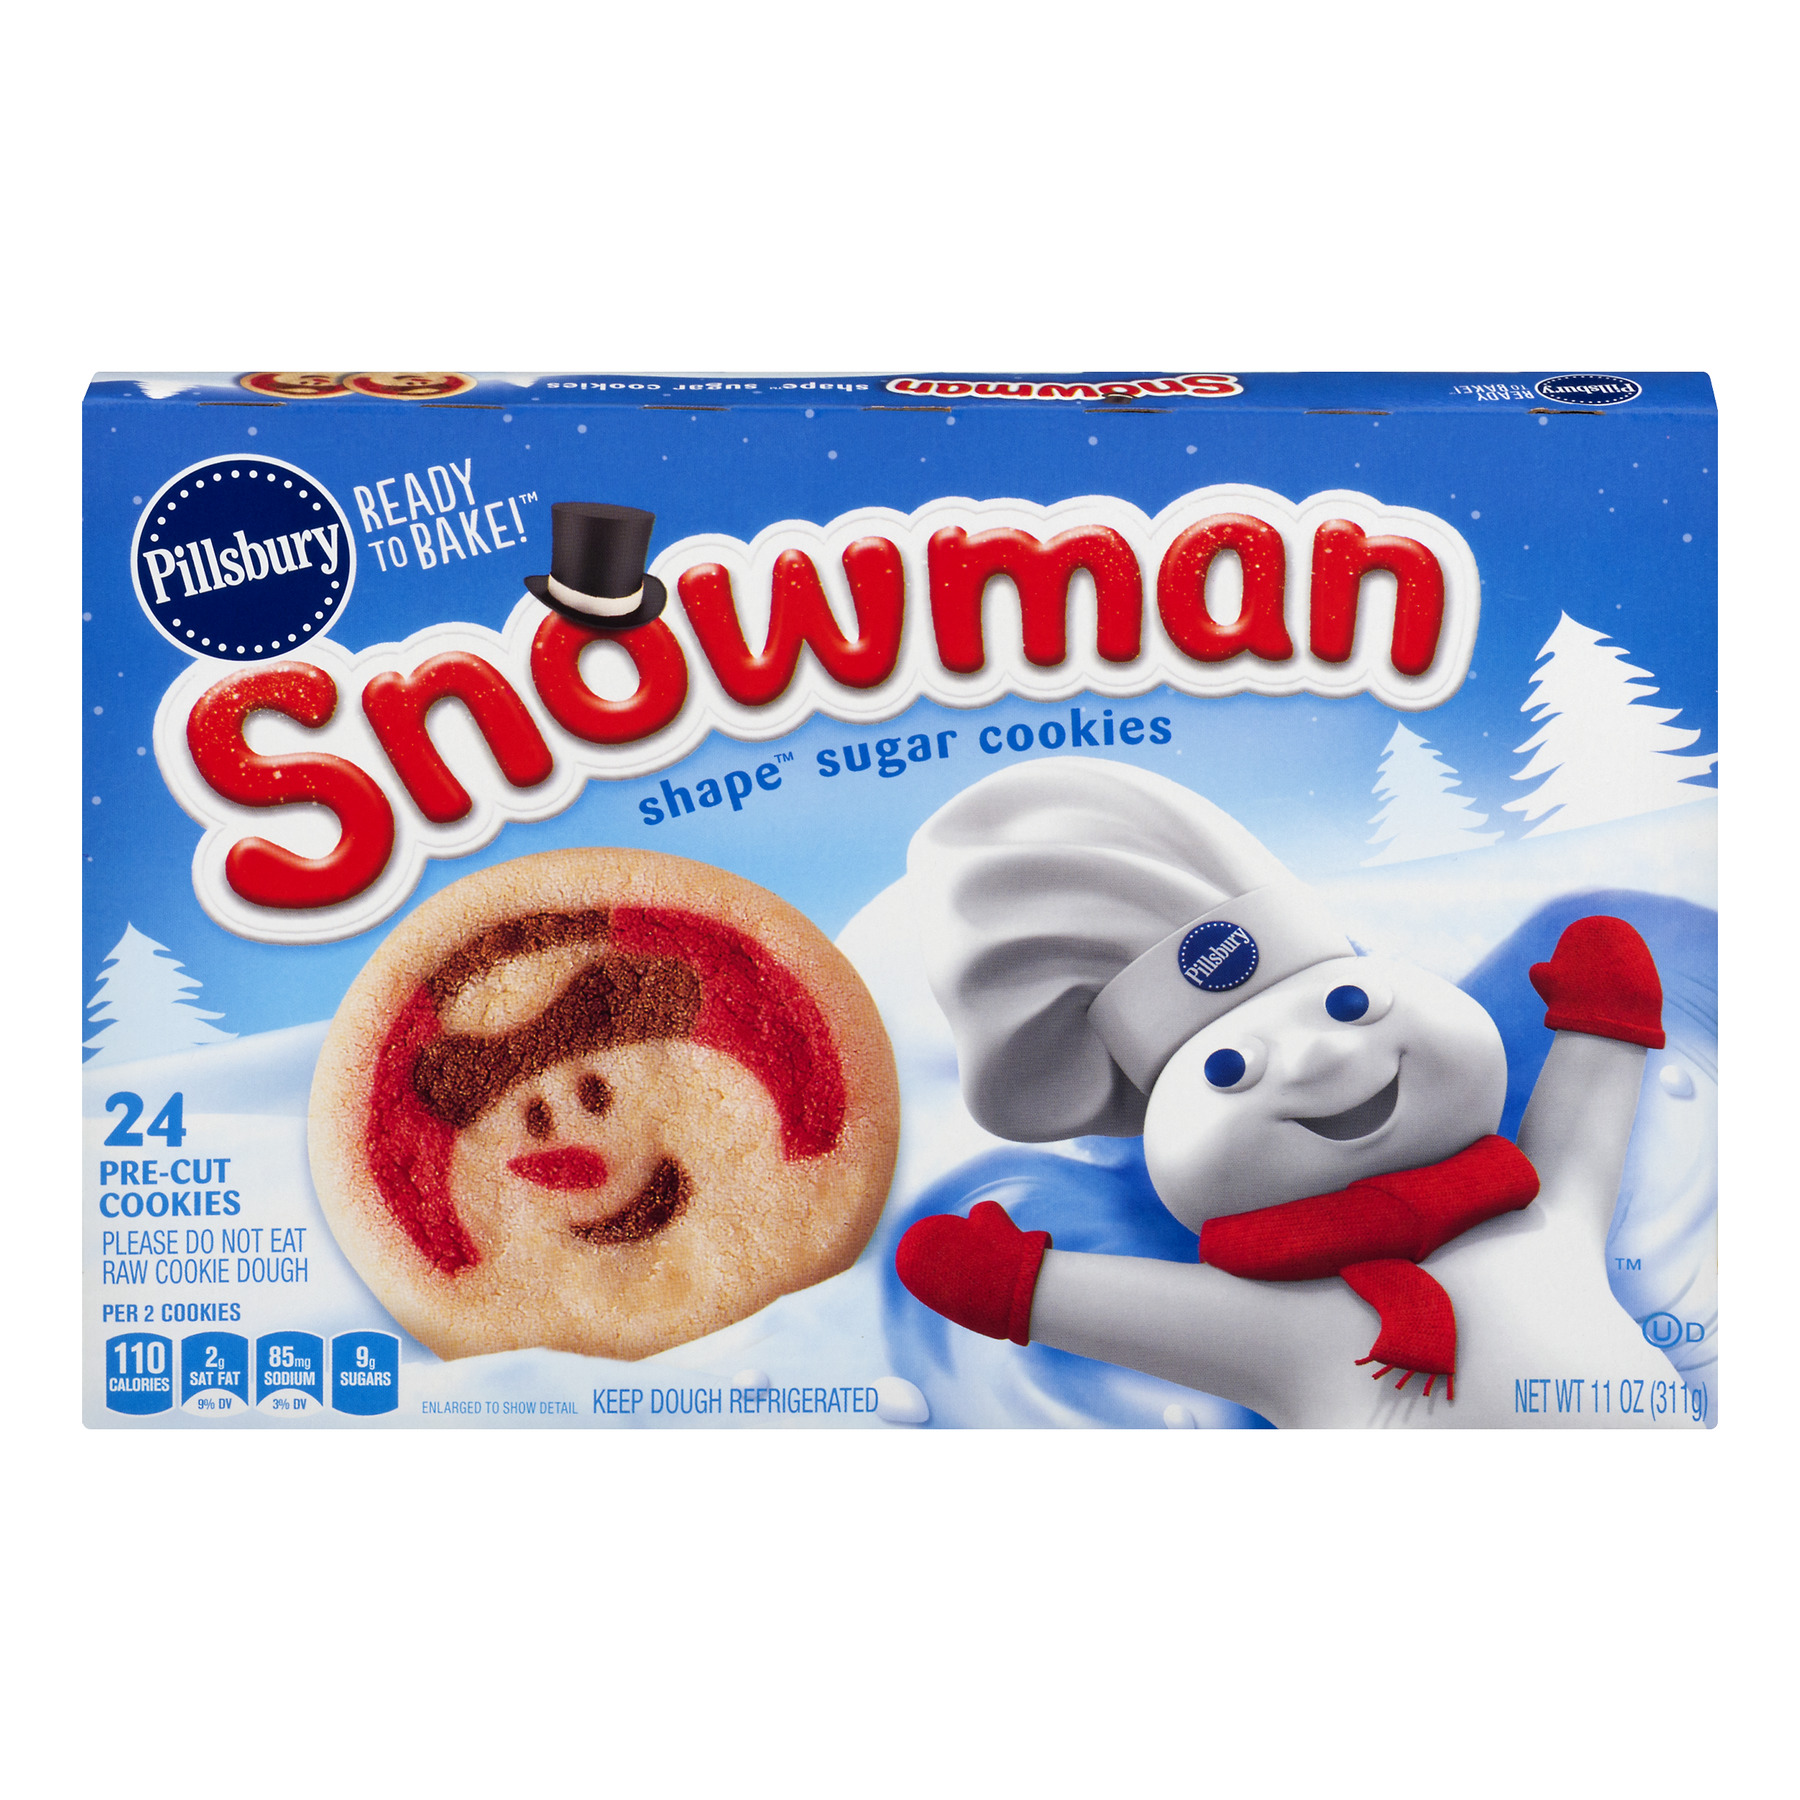 Pillsbury Ready To Bake Snowman Shape Sugar Cookies 24